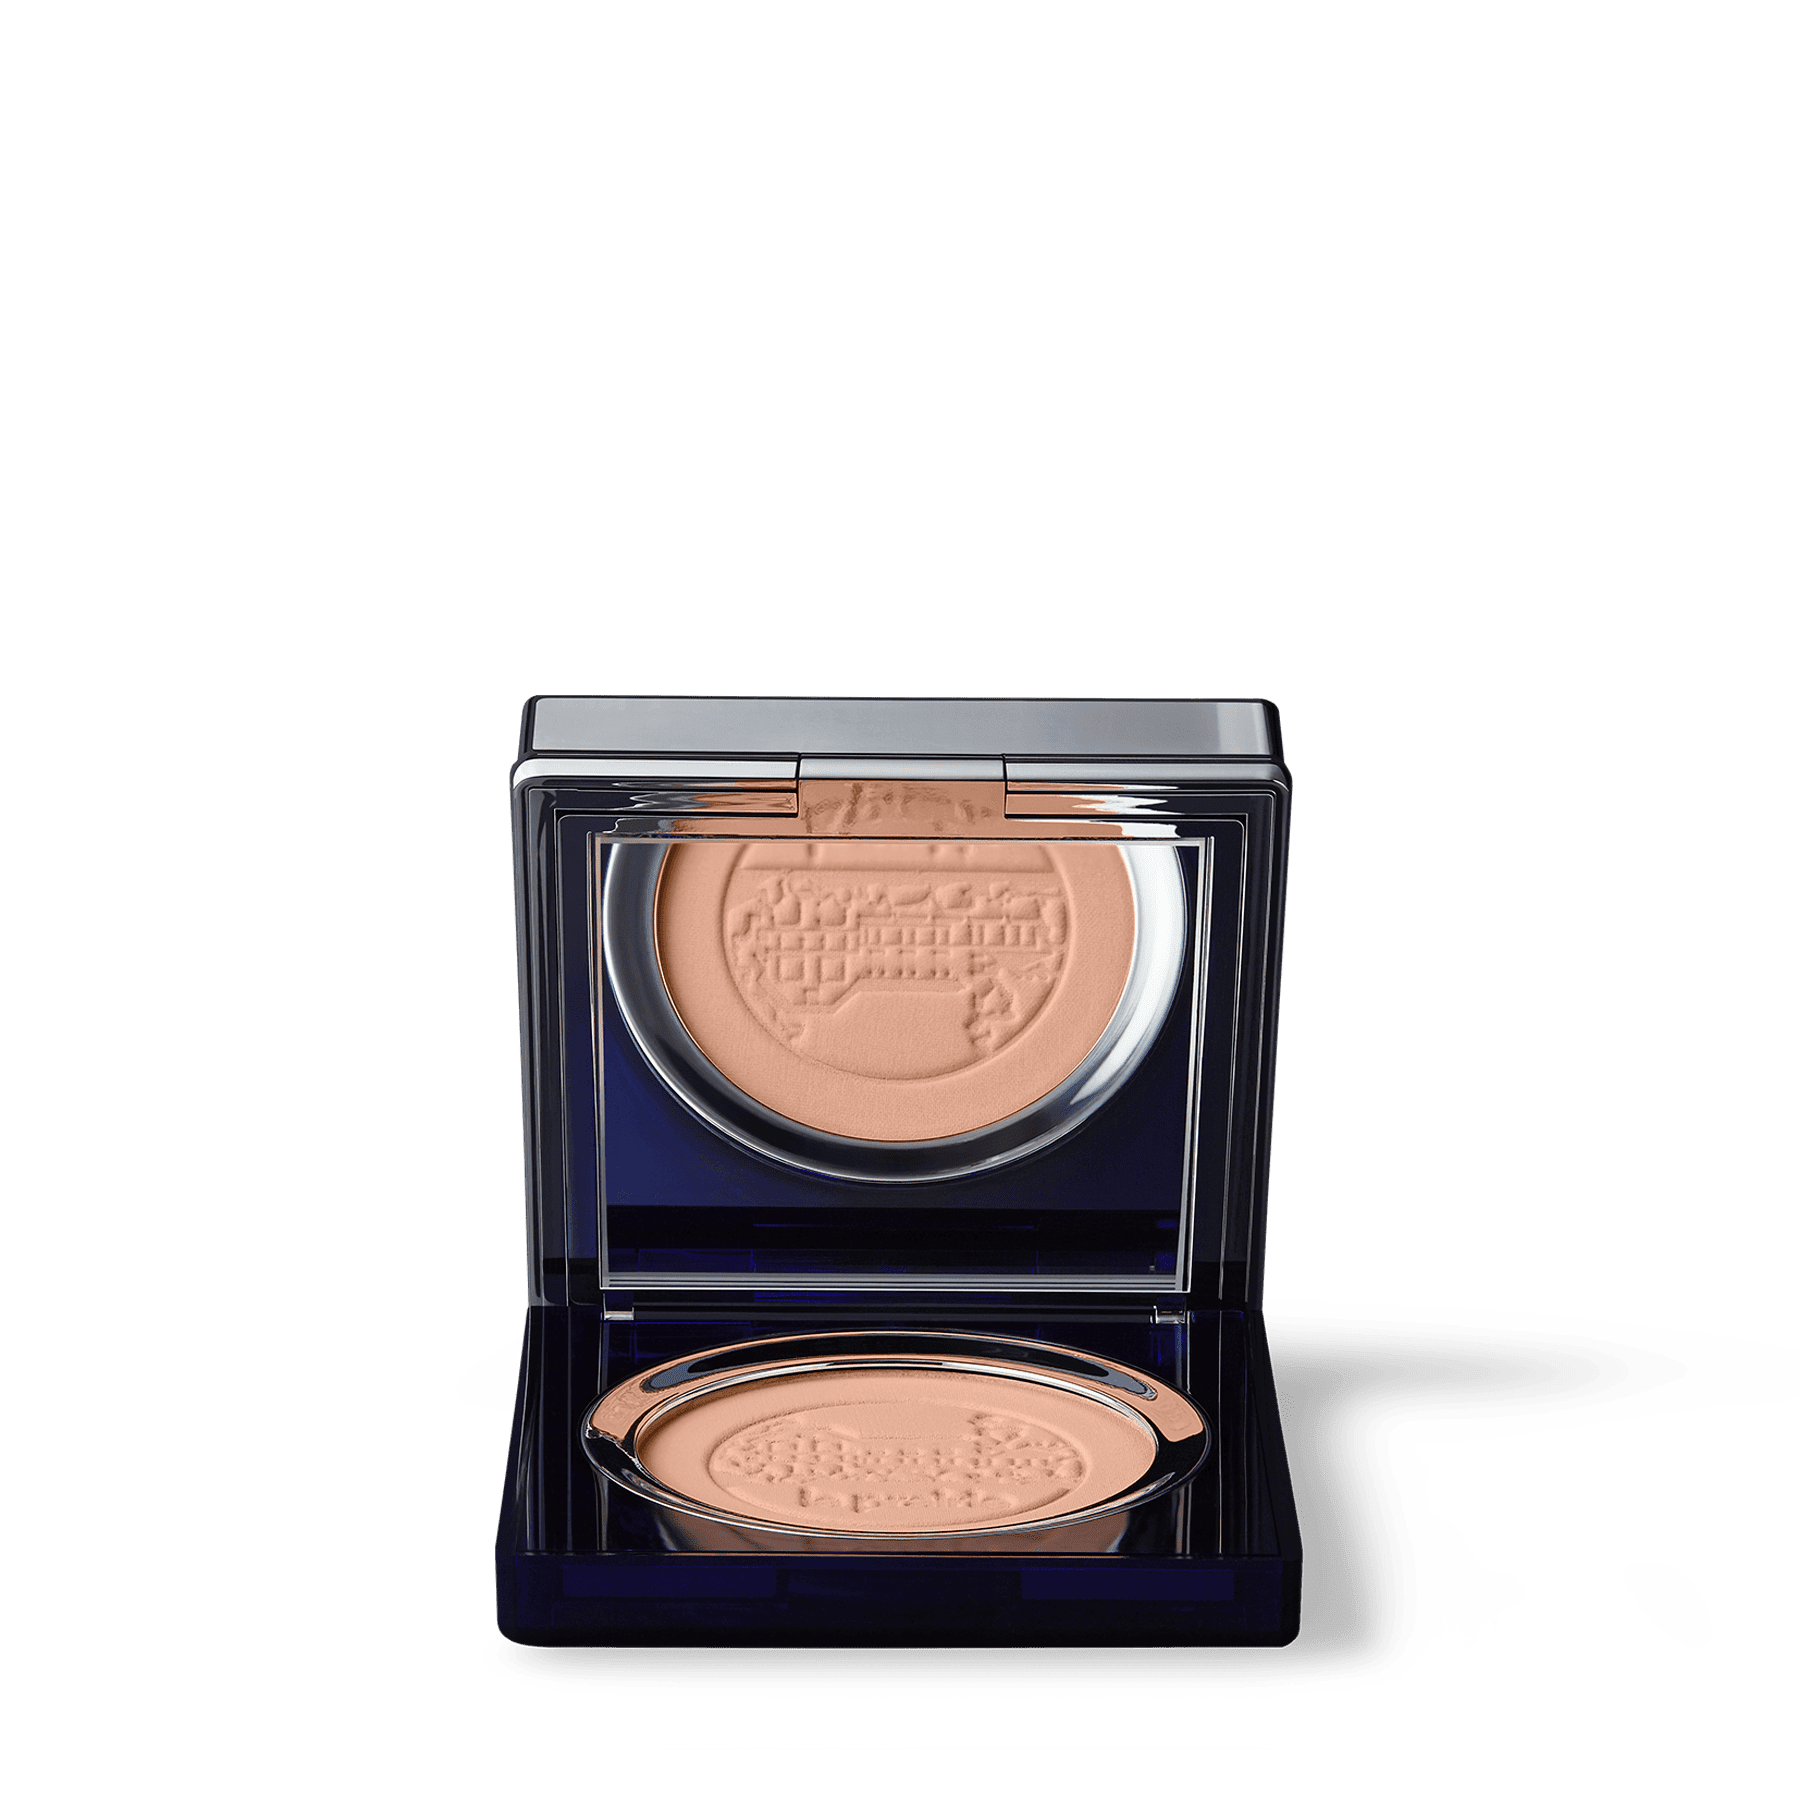 skin caviar powder foundation compact